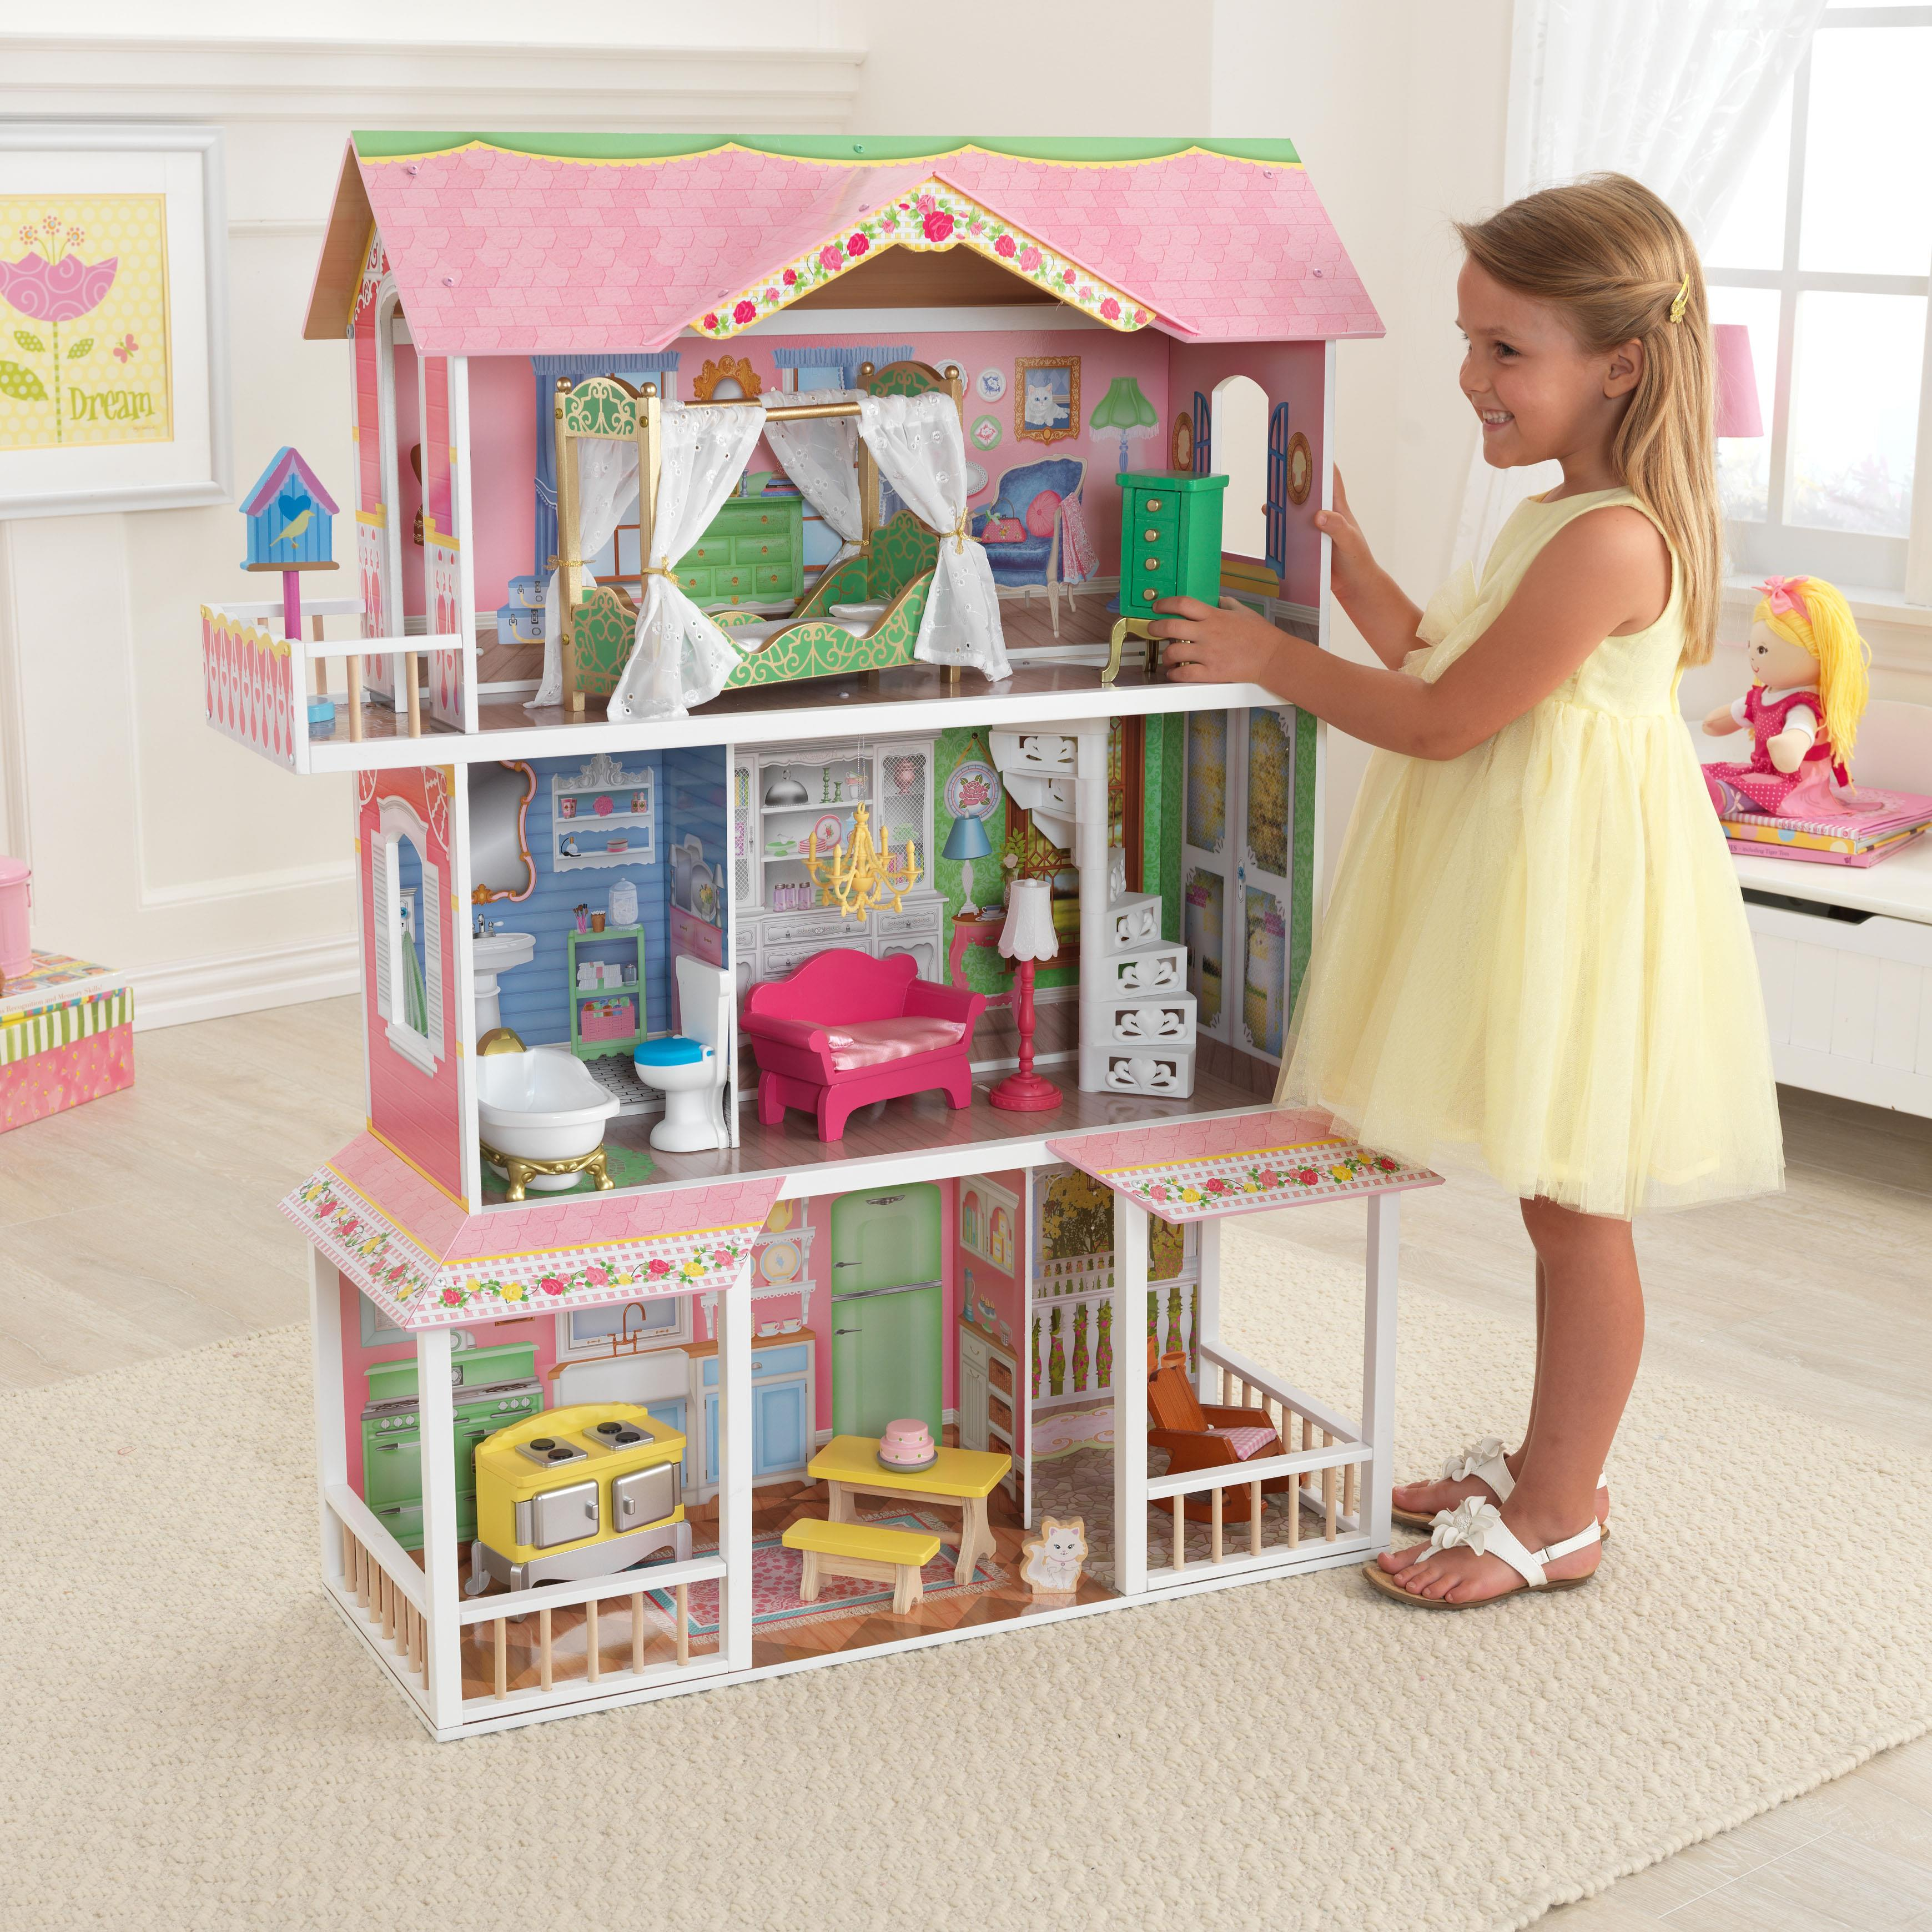 Kidkraft Sweet Savannah Dollhouse With Furniture By Oj Commerce 65851